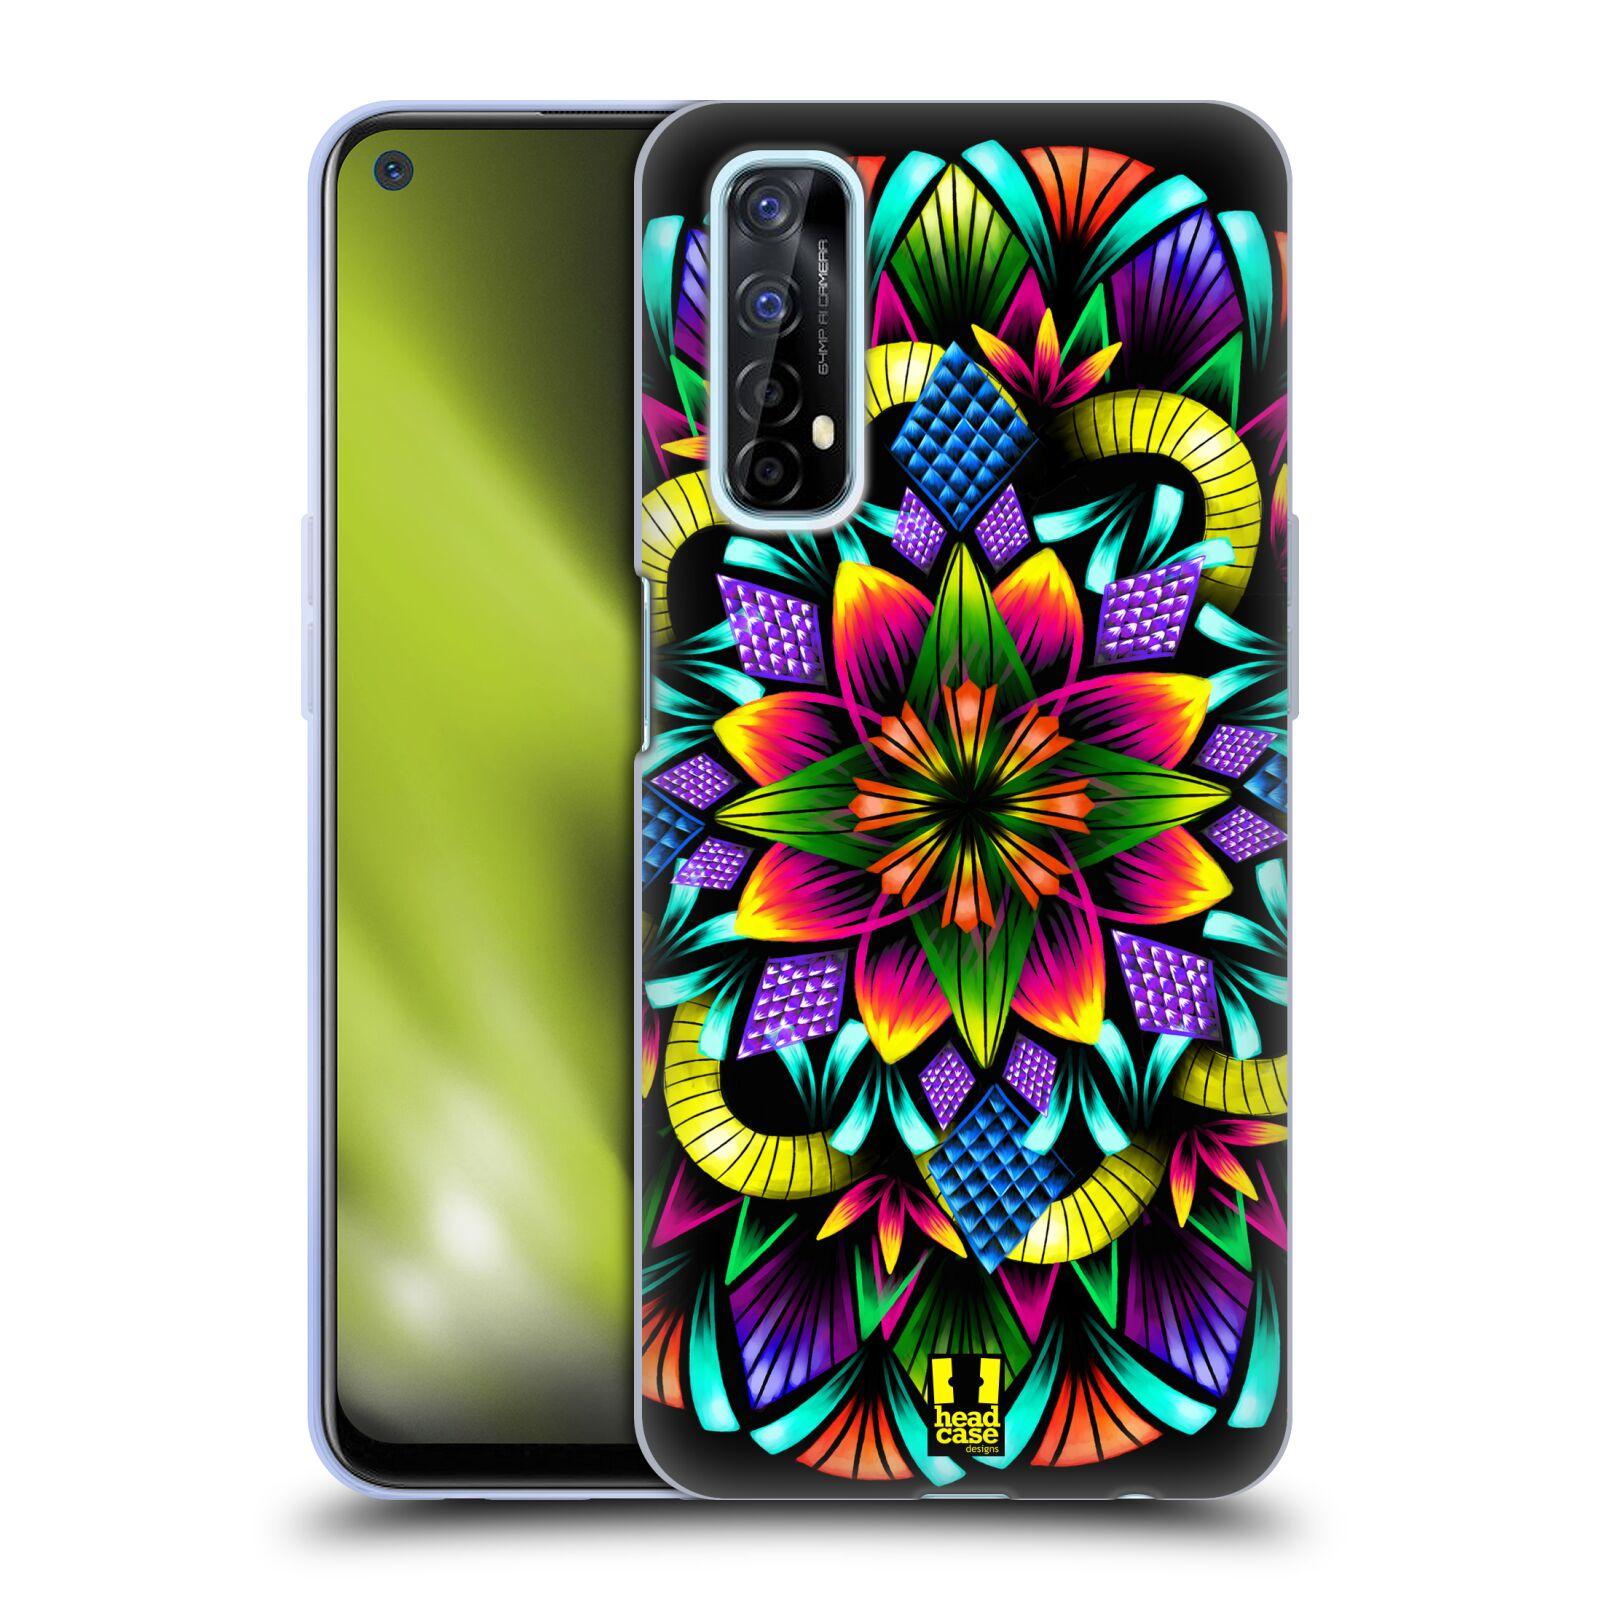 Silikonové pouzdro na mobil Realme 7 - Head Case - Květina mandala